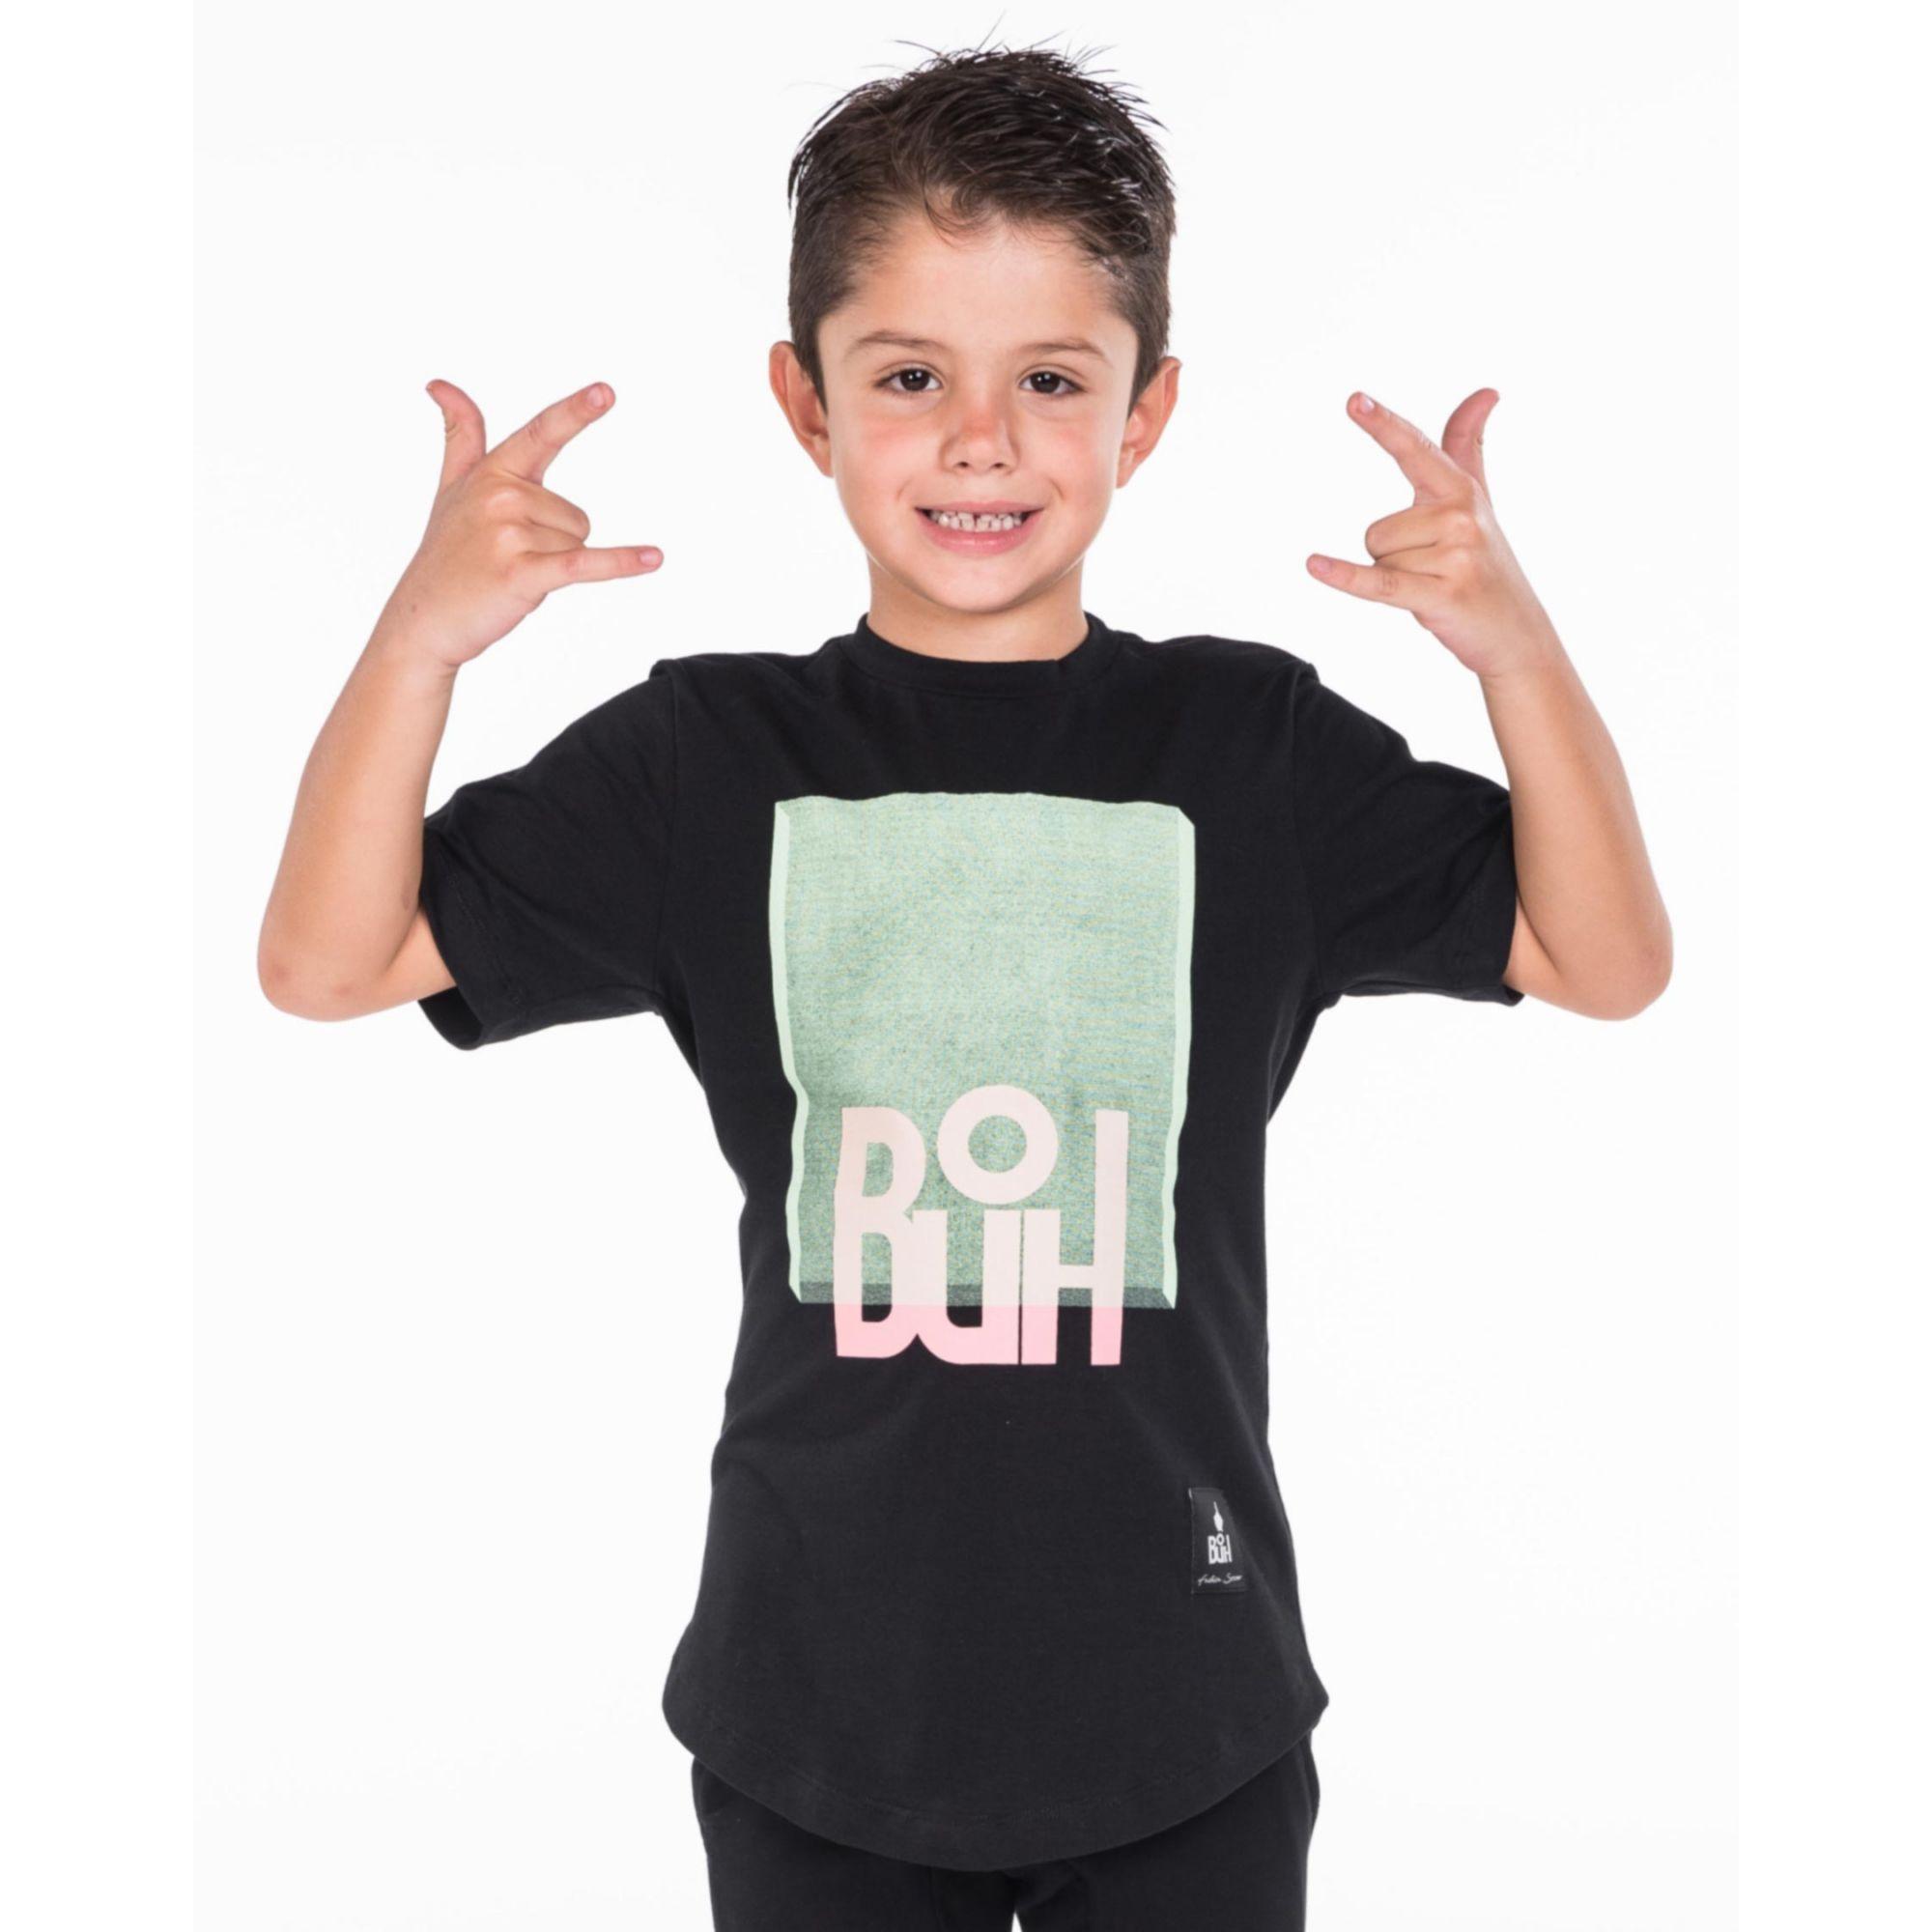 Camiseta Buh Kids Candy Colors